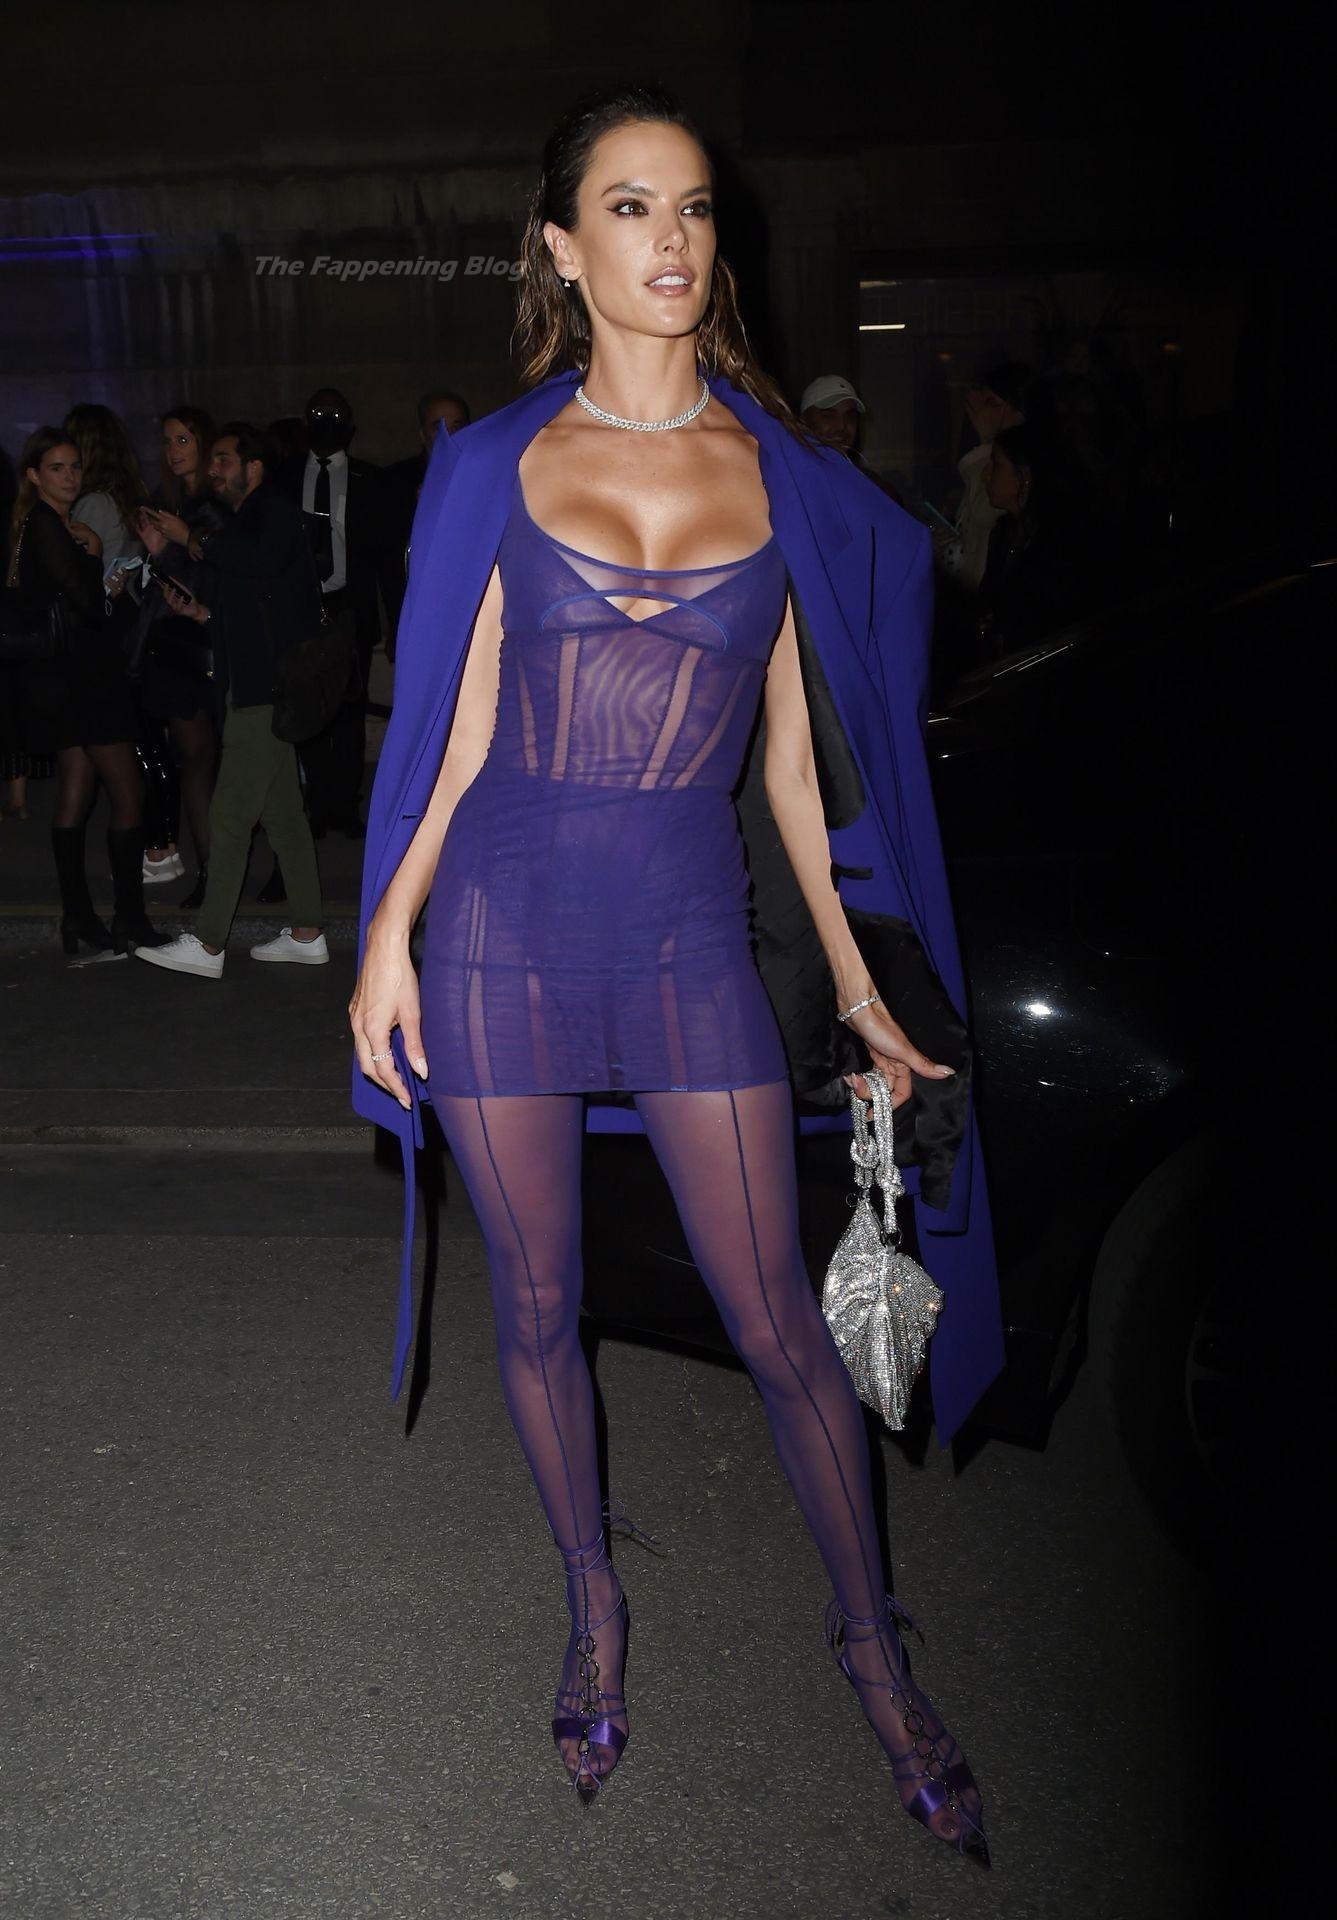 Alessandra-Ambrosio-Sexy-The-Fappening-Blog-21-2.jpg